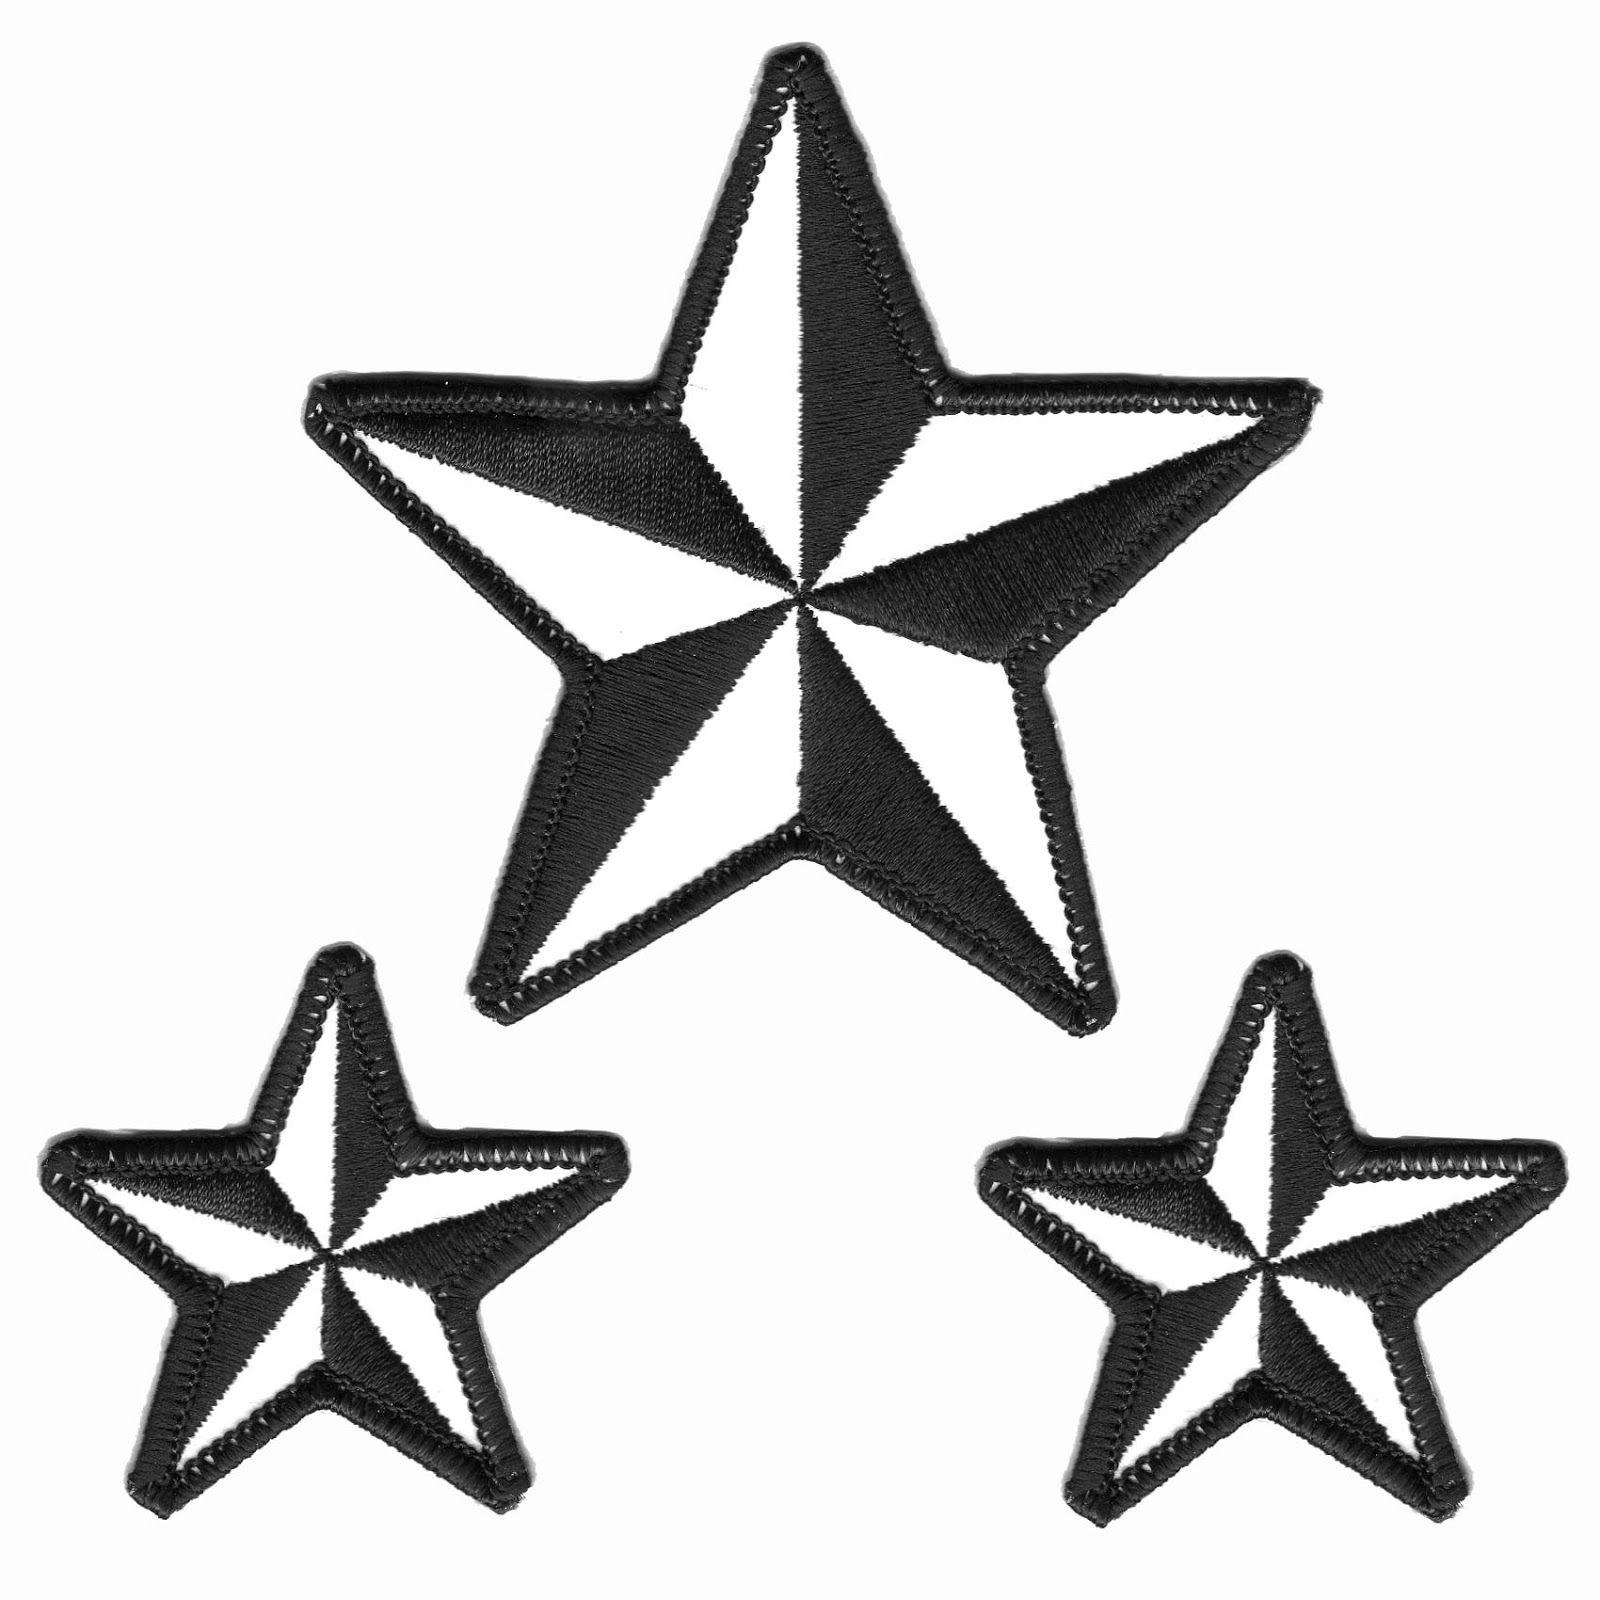 halloween clip art star swirls clipart Swirling stars gothic clip art red foil stars star swirl clip a falling stars magic star image